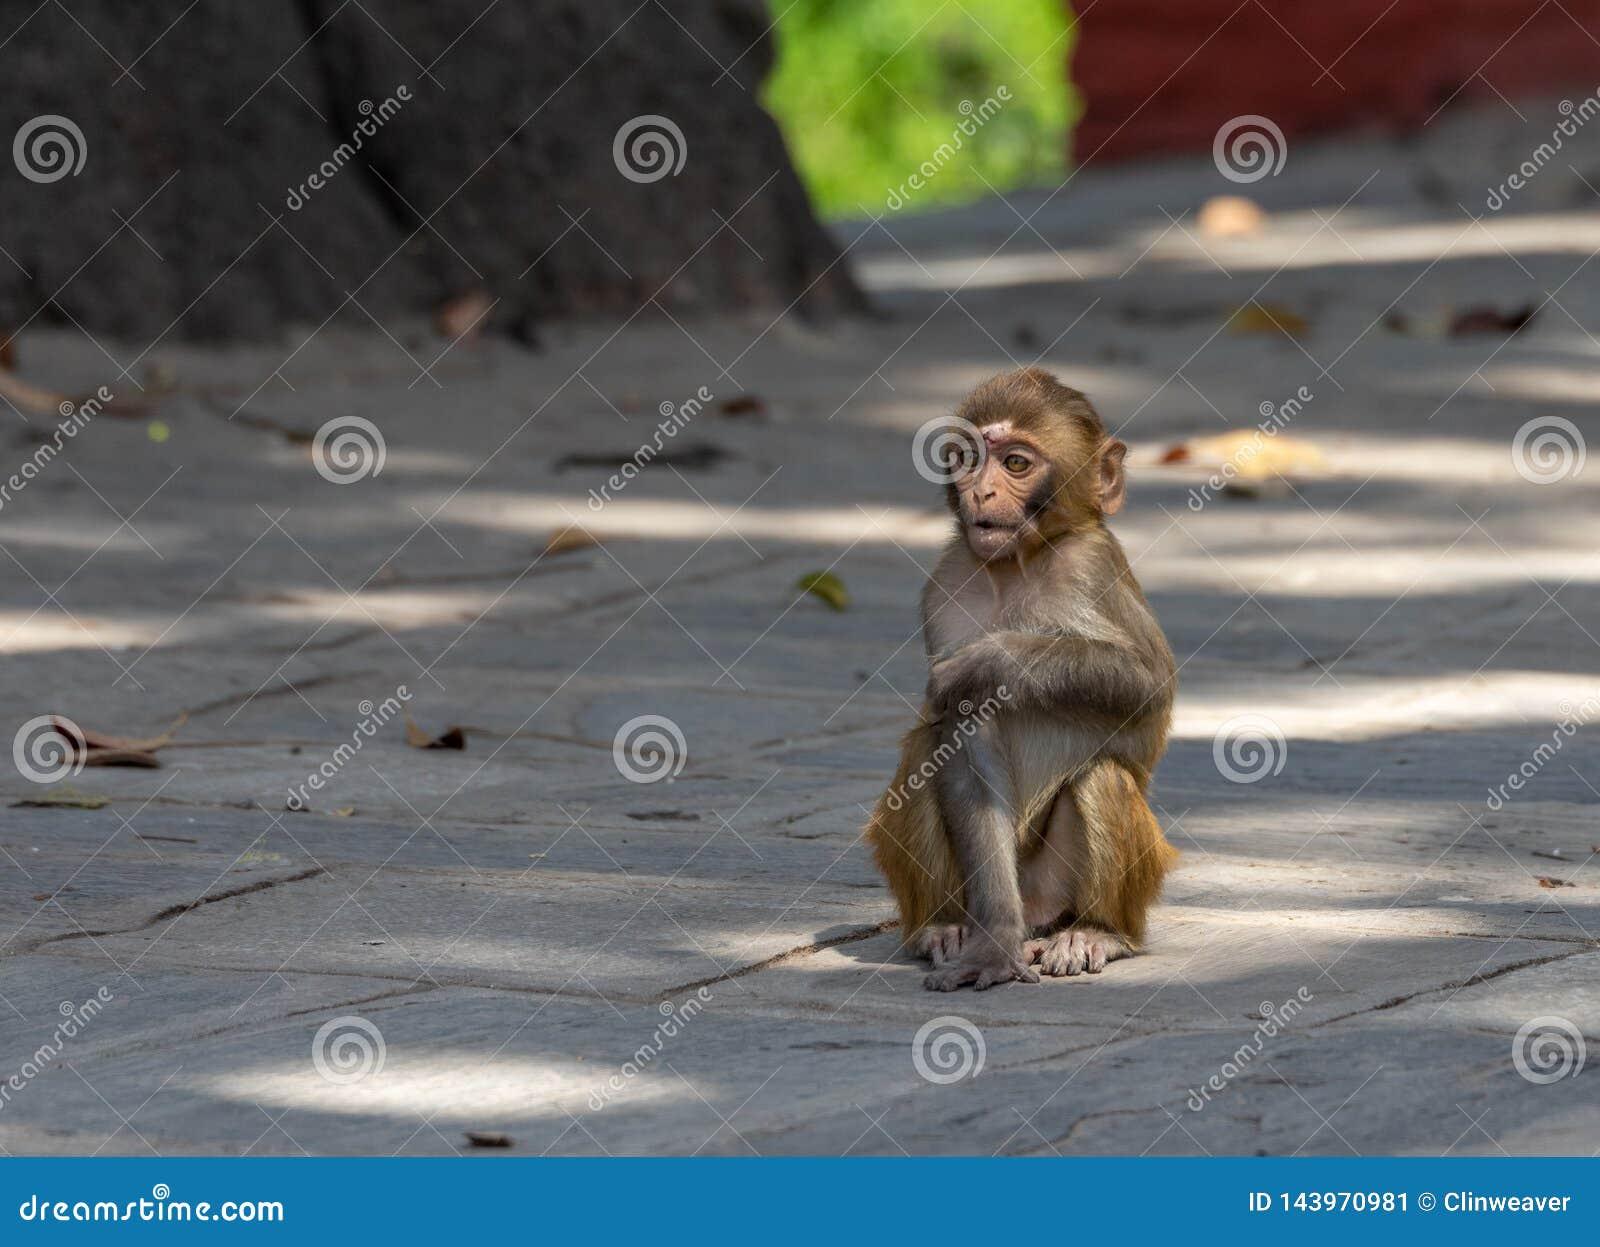 Baby Macaque or Macaca